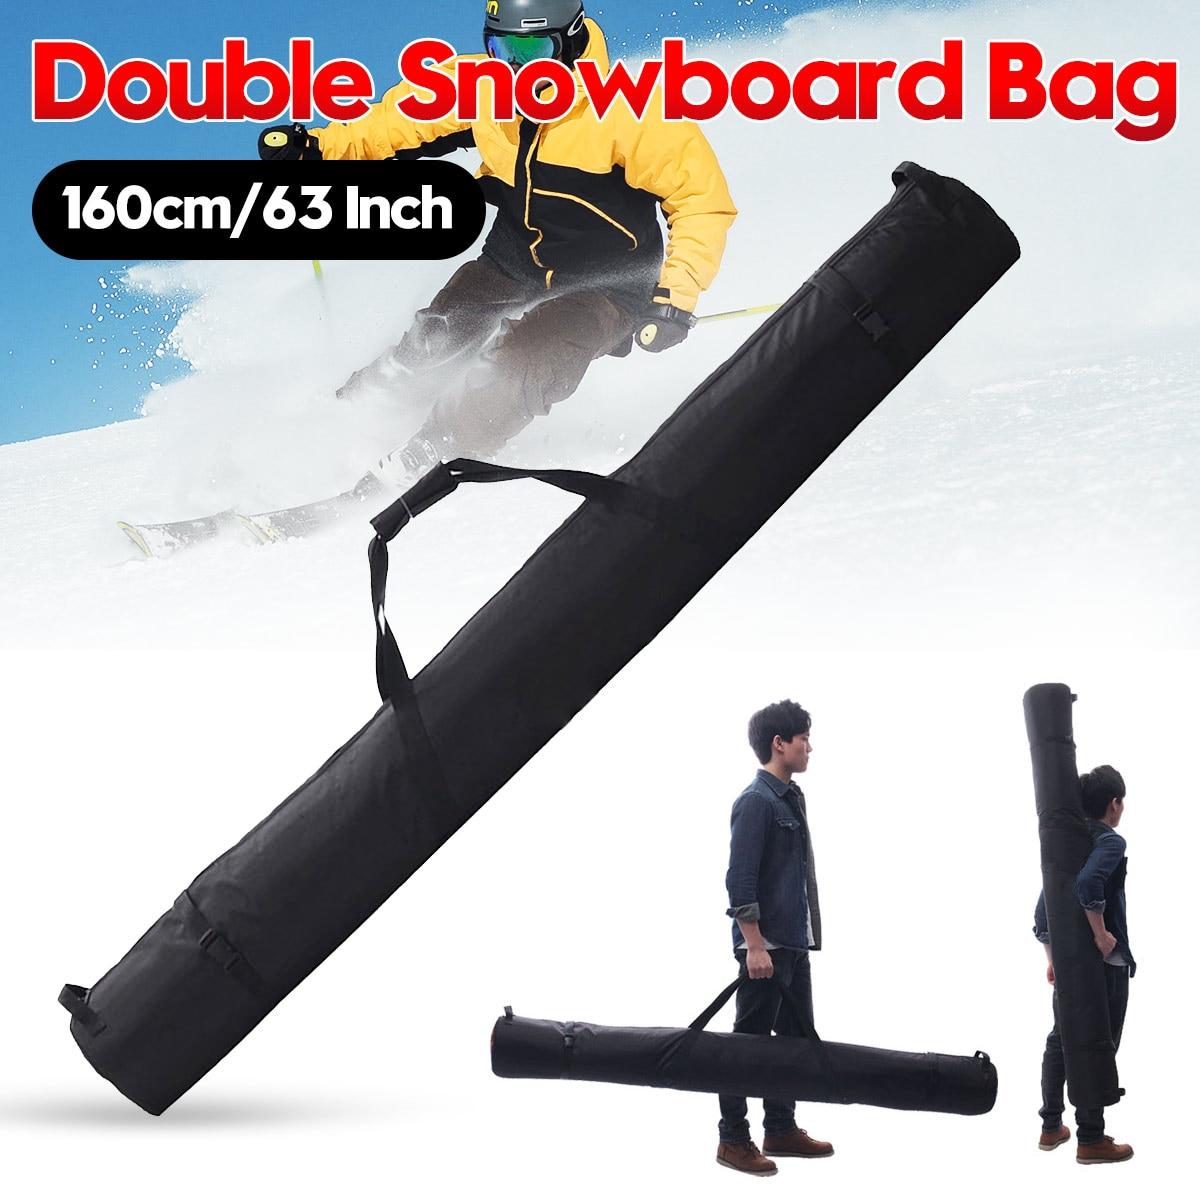 Bolsa de Snowboard de 160 cm/63 pulgadas para Snowboard doble en poliéster, bolsa deportiva para Snowboard, bolsa para Snowboard